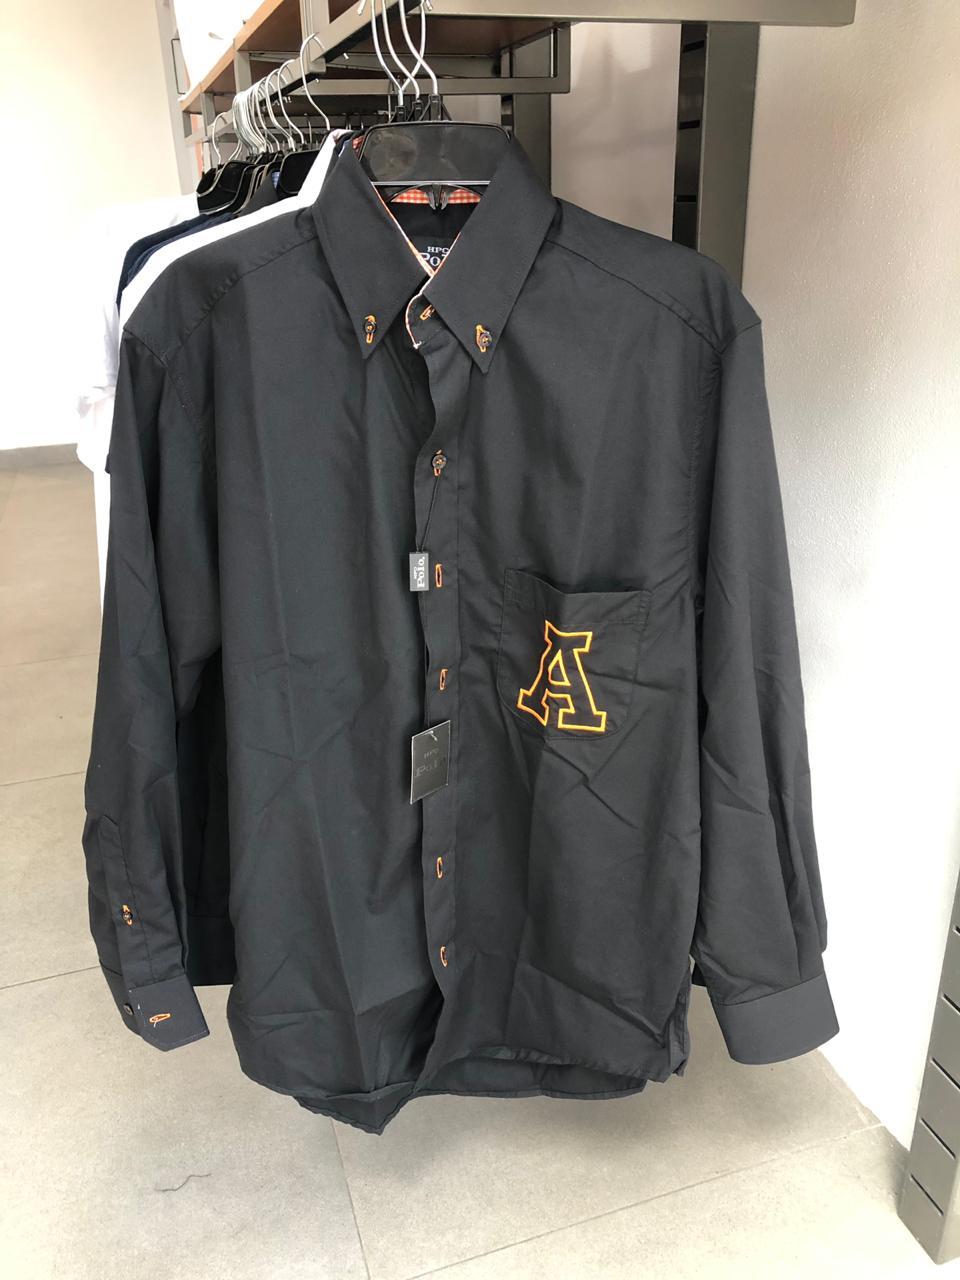 Camisa negra y naranja Anáhuac G